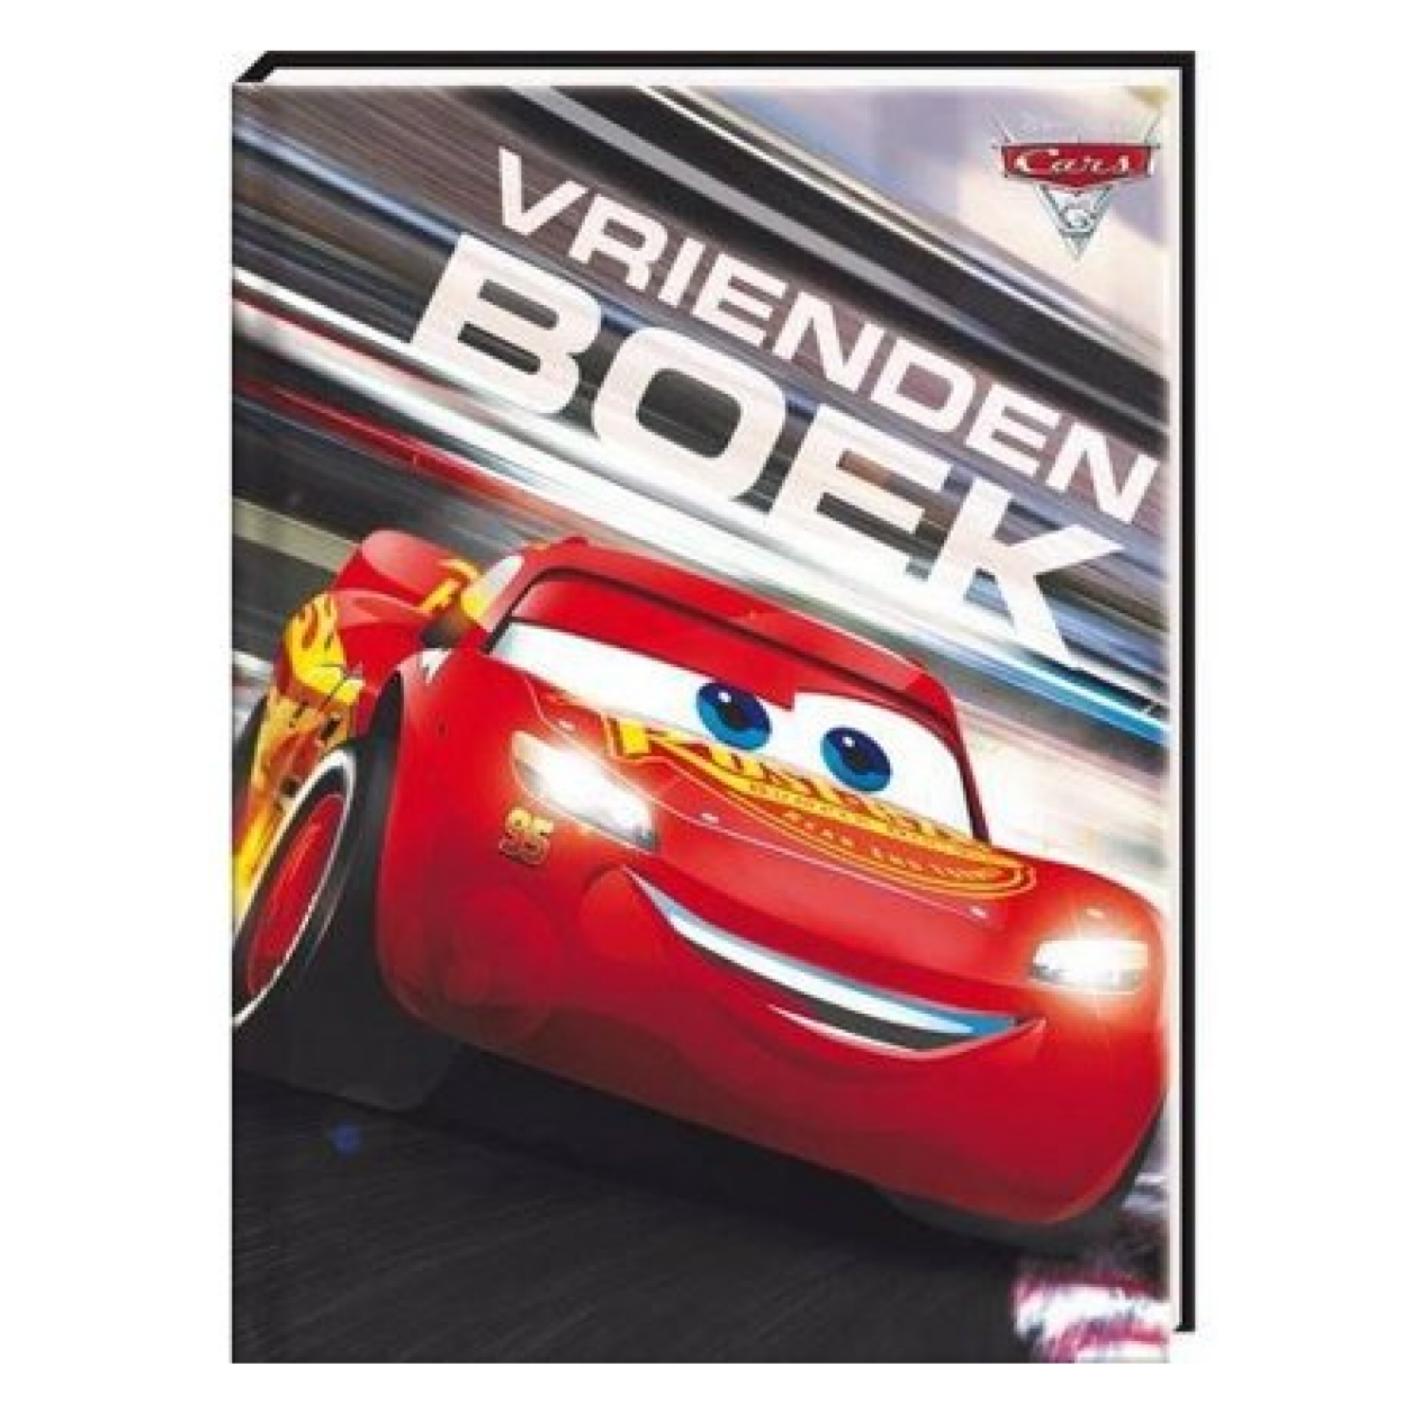 Boek - Vriendenboekje - Cars 3 - in Dagboeken & Vriendenboekjes